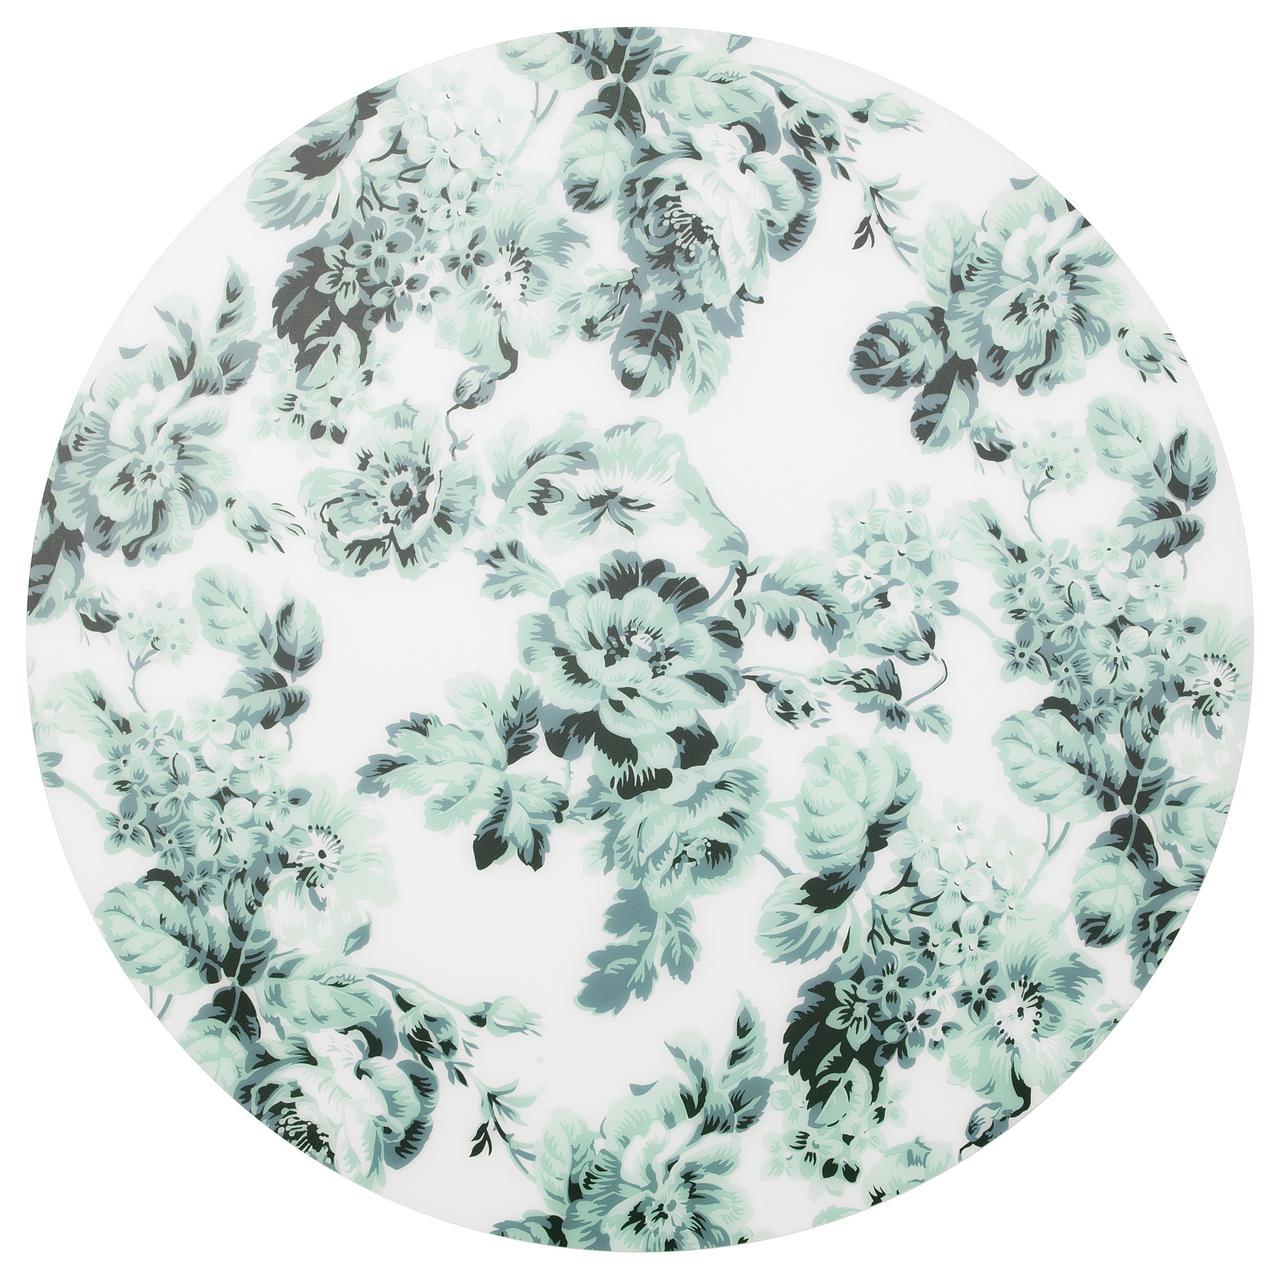 СМАКСИННЕ Салфетка под приборы, бел/зелен, цветок